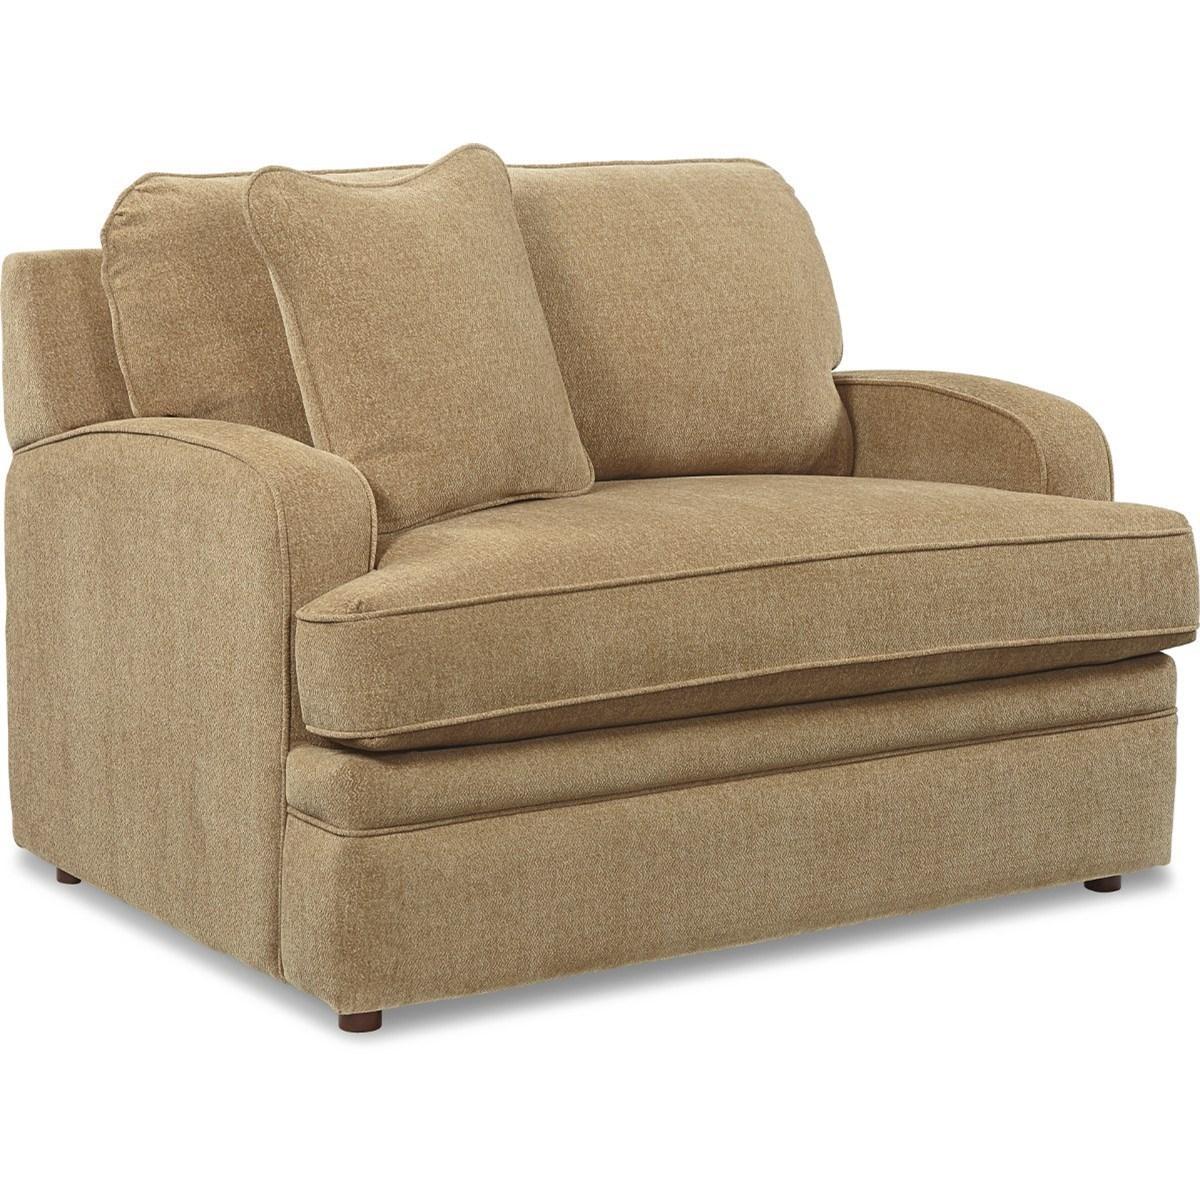 Twin Sleep Chair; La Z Boy DianaSUPREME COMFORT?